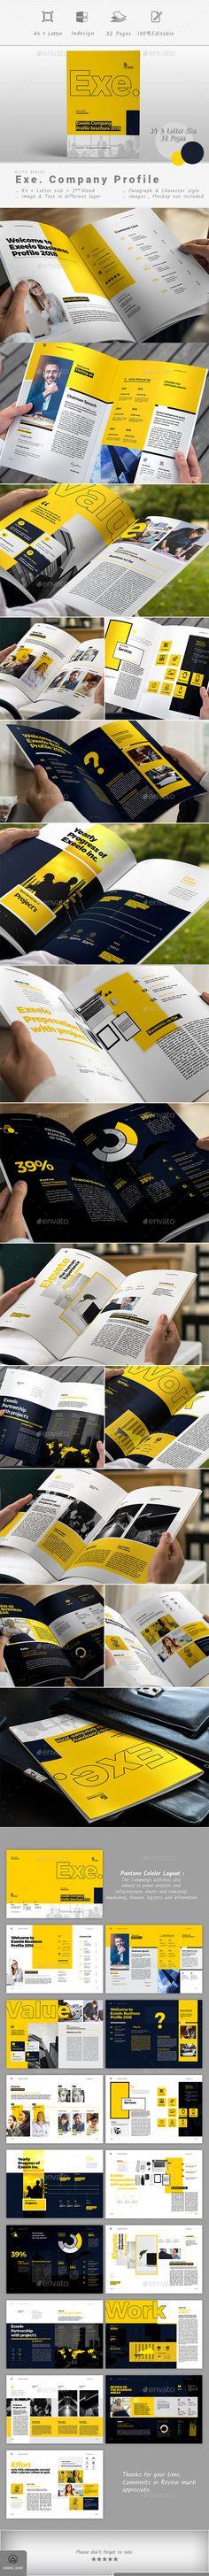 Company Profile - Corporate Brochures Luxury Brochure, Corporate Brochure, Business Brochure, Travel Brochure Template, Brochure Design, Corporate Profile, Business Profile, Company Profile Template, Editorial